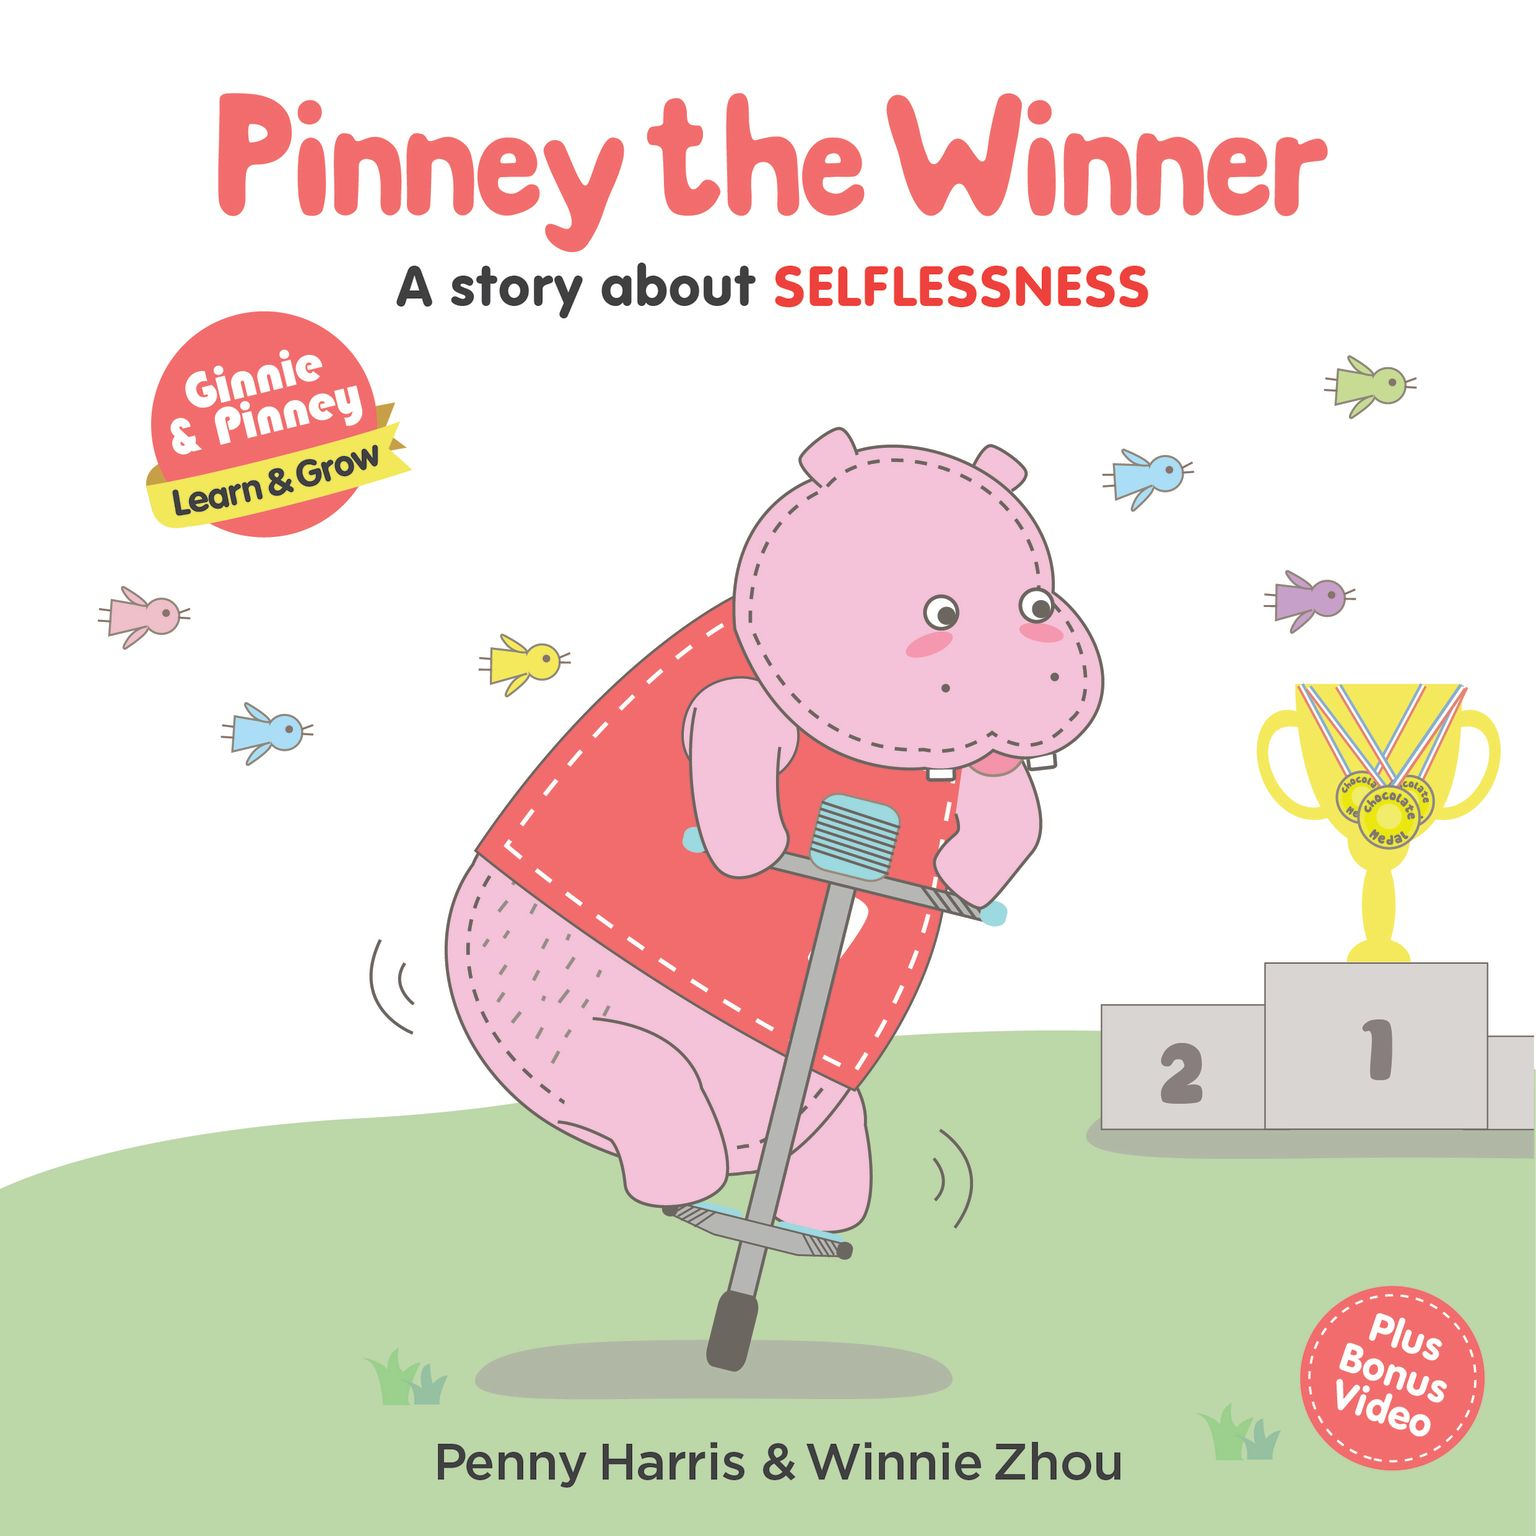 Ginnie & Pinney – Pinney the Winner